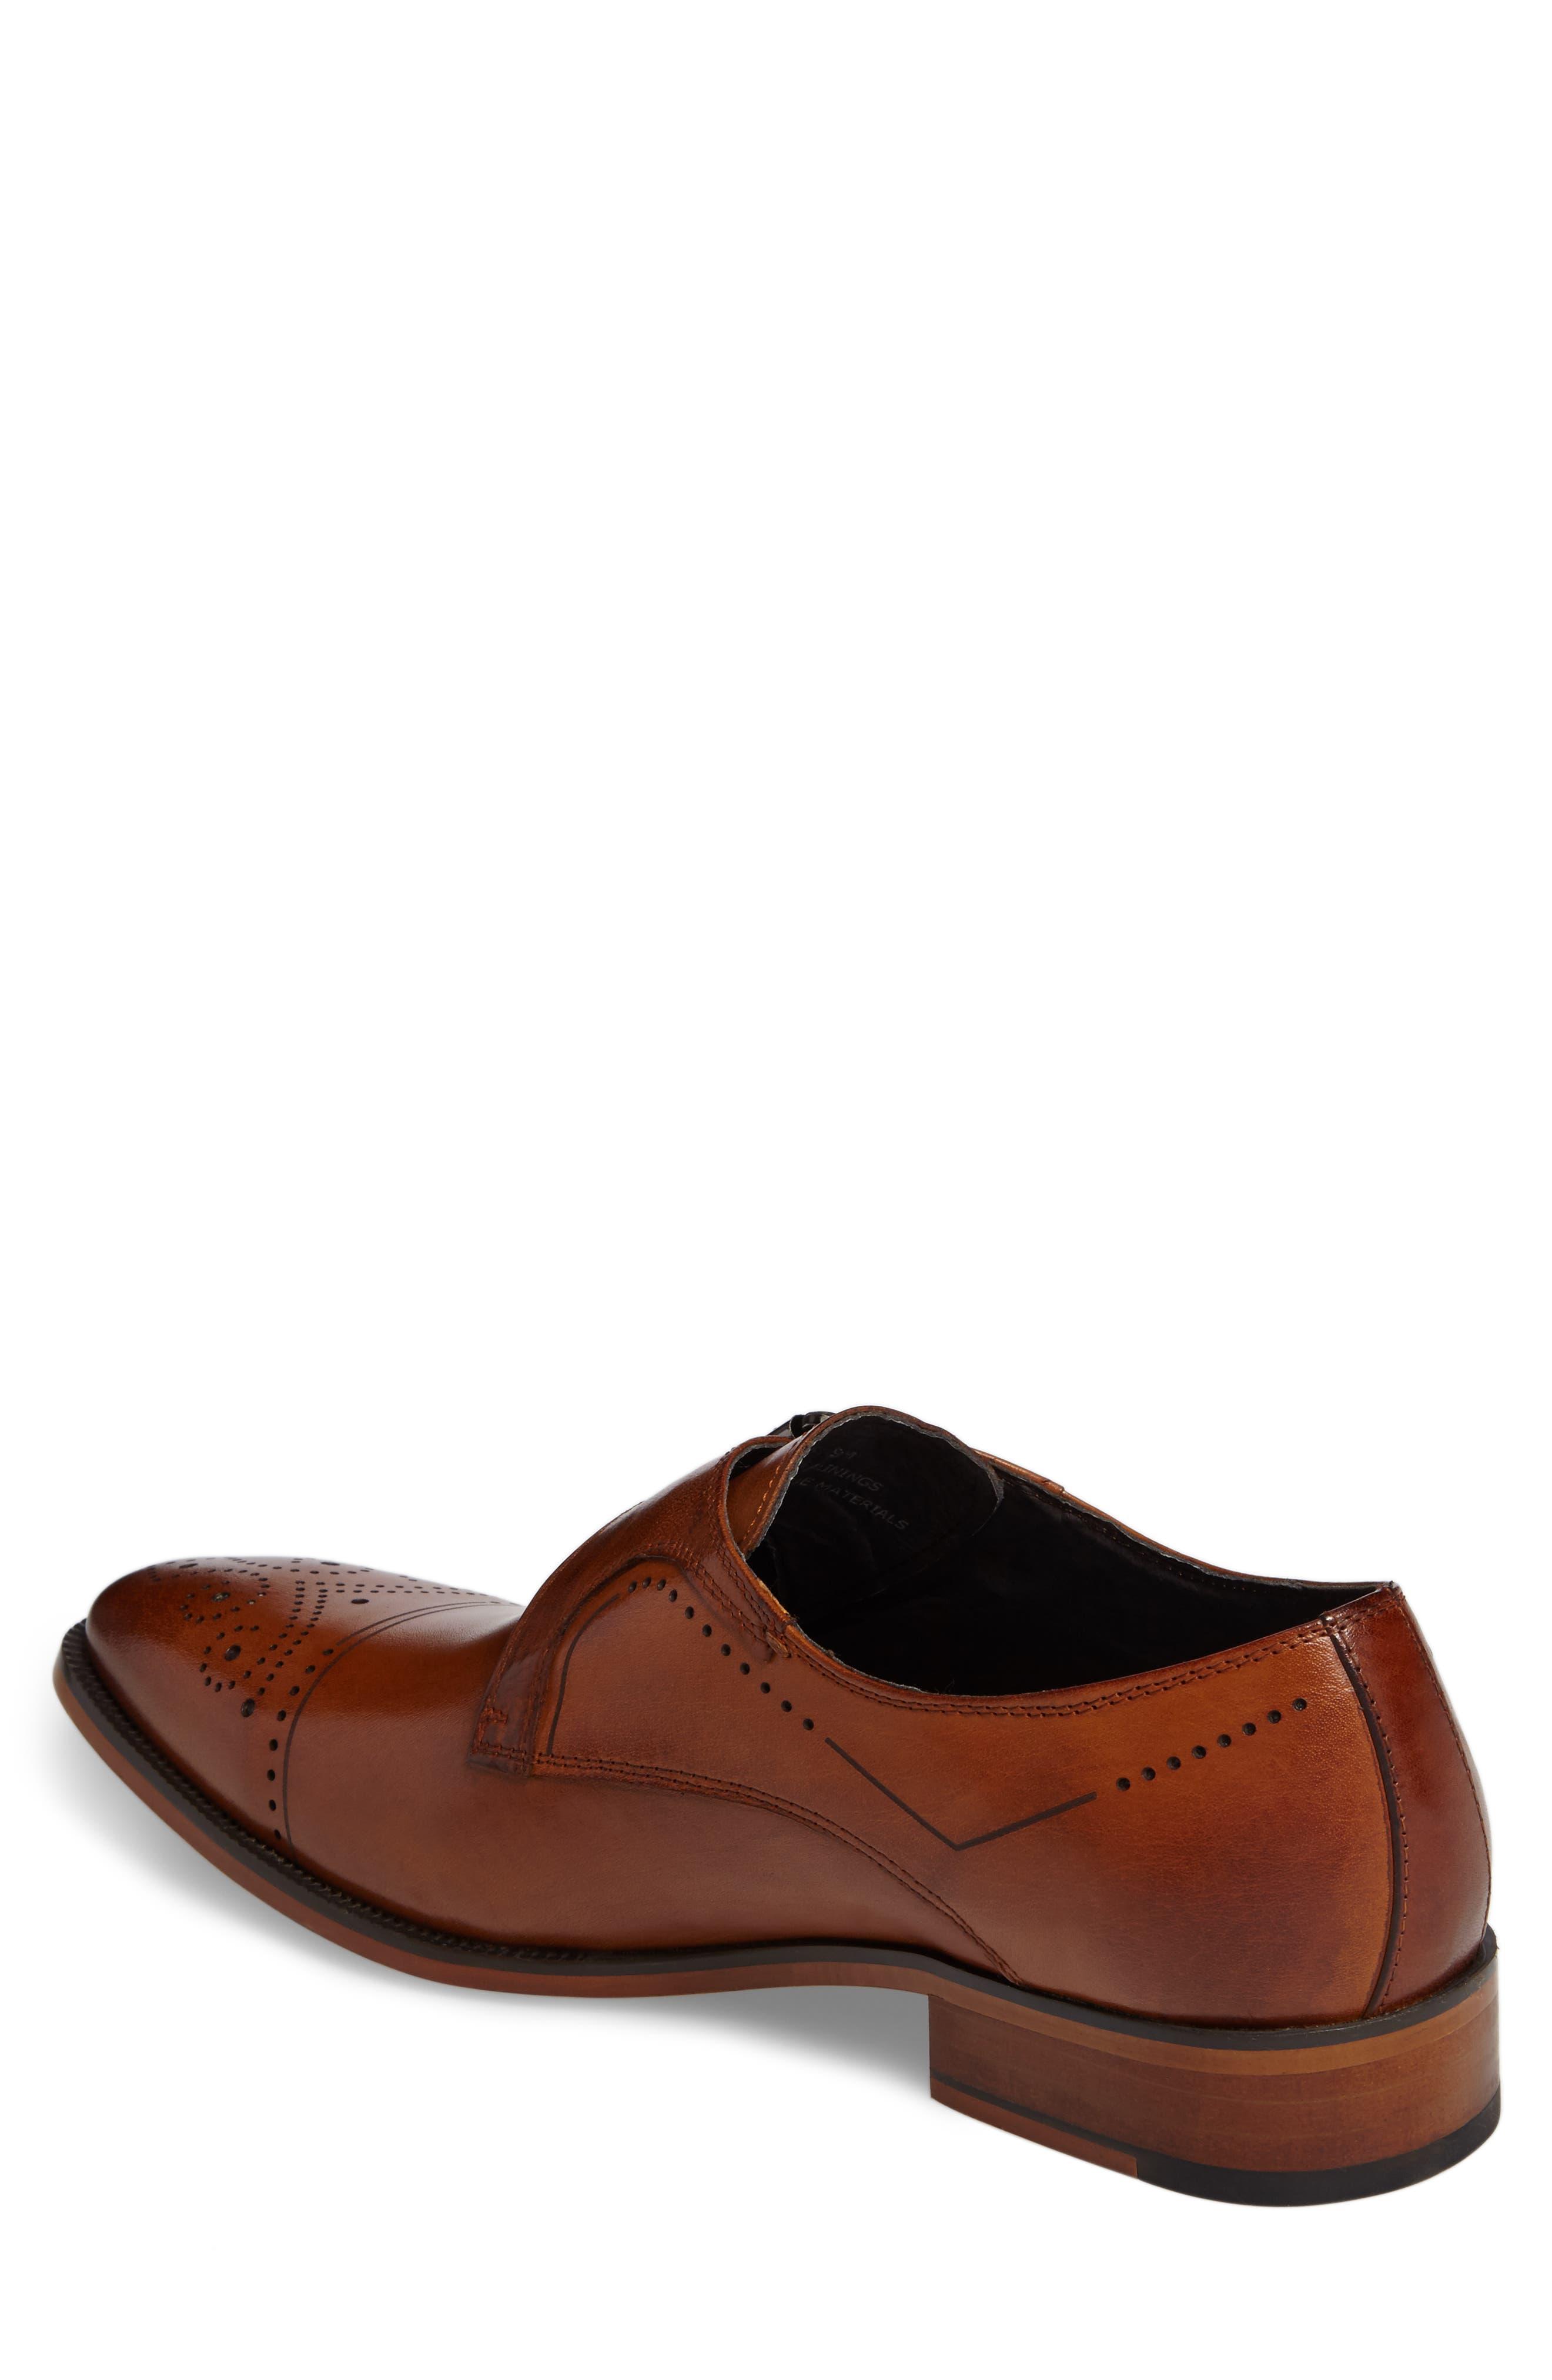 Kimball Monk Strap Shoe,                             Alternate thumbnail 2, color,                             SADDLE TAN LEATHER